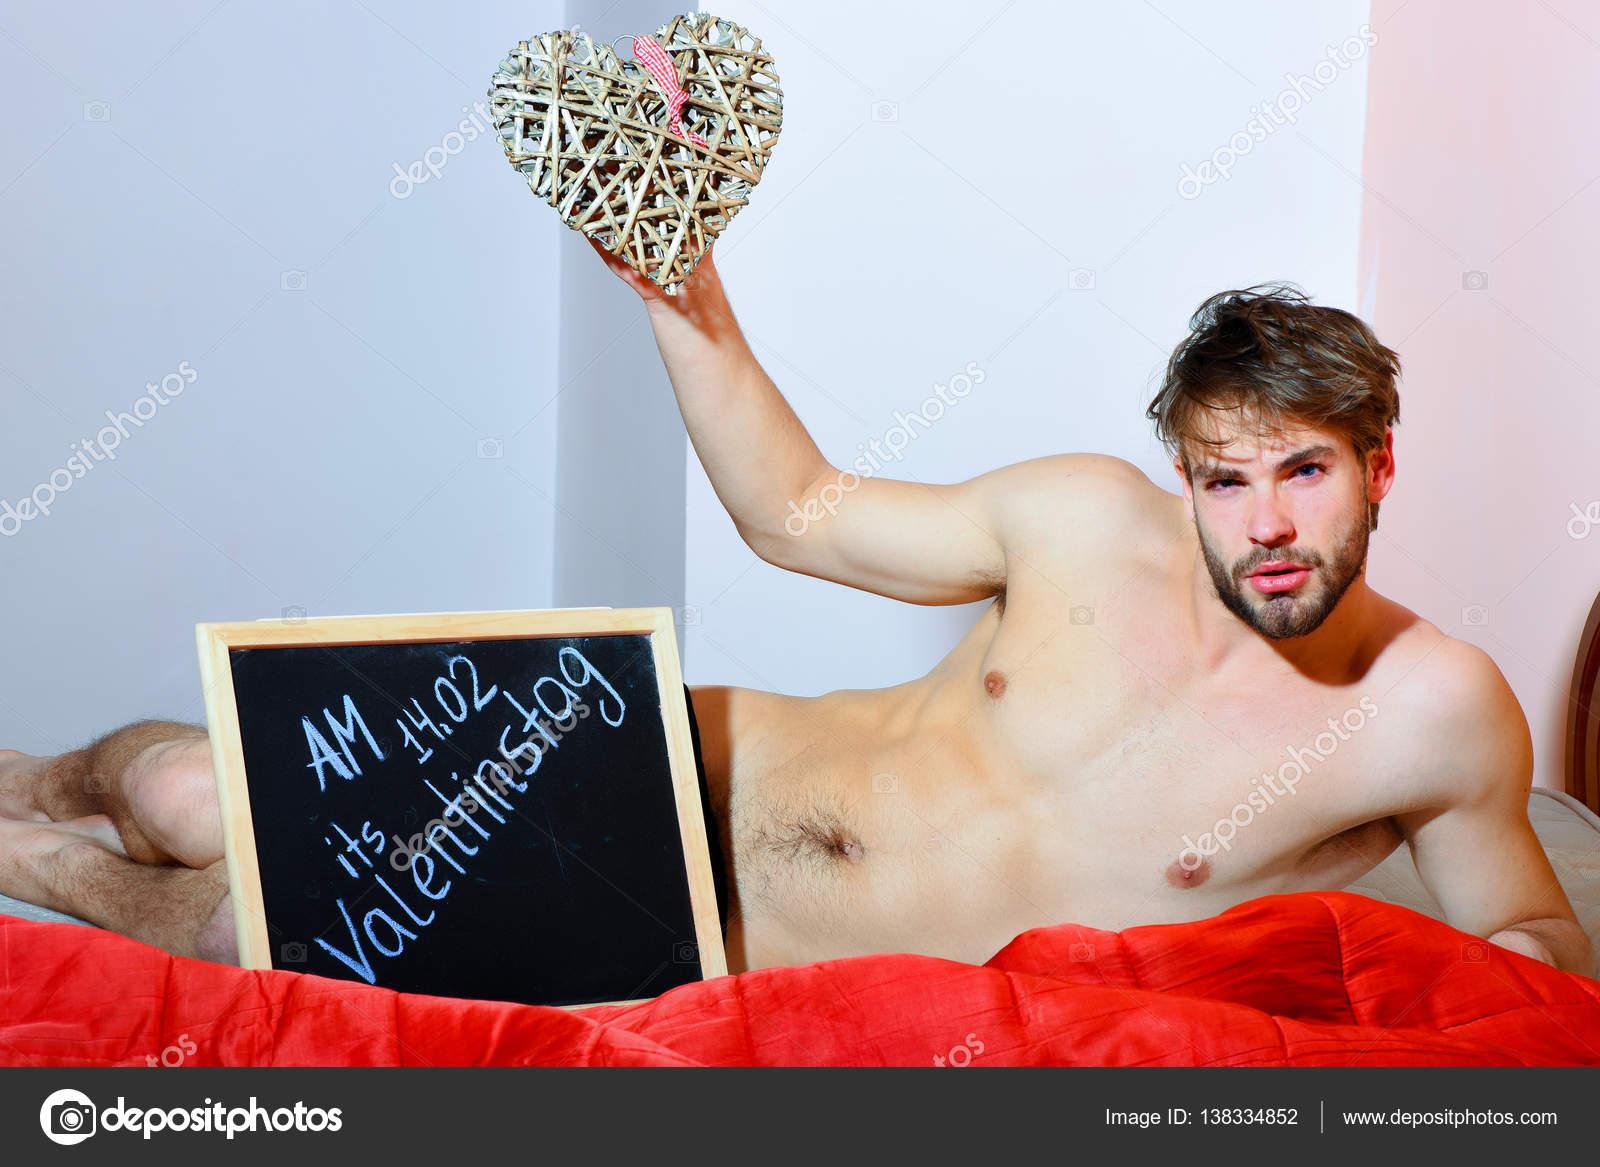 Nacked porn women pics